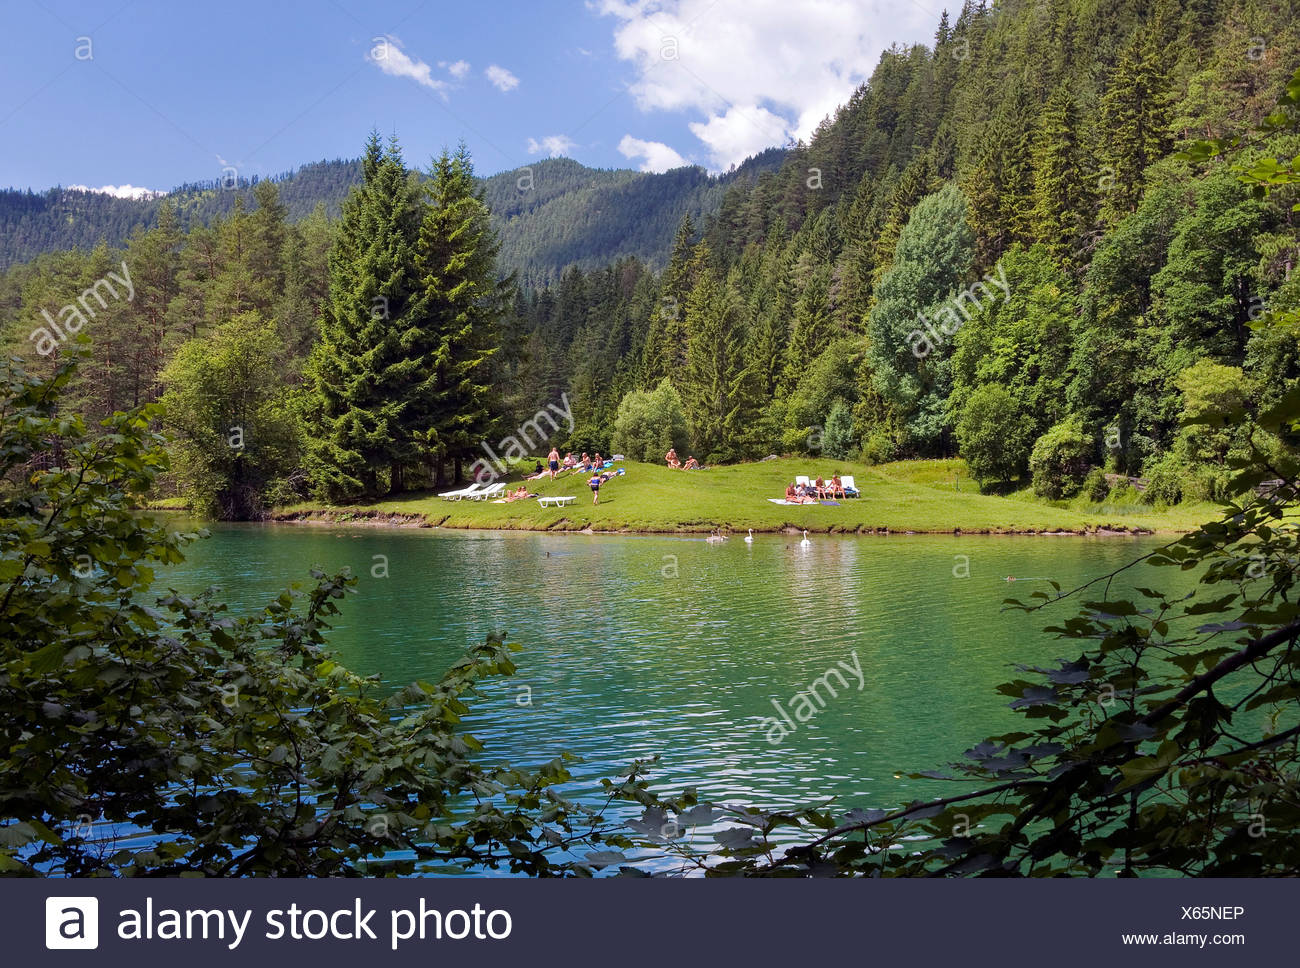 Fernsteinsee lake, bank, swimming guests, summer, Tirol, Austria, Europe Stock Photo